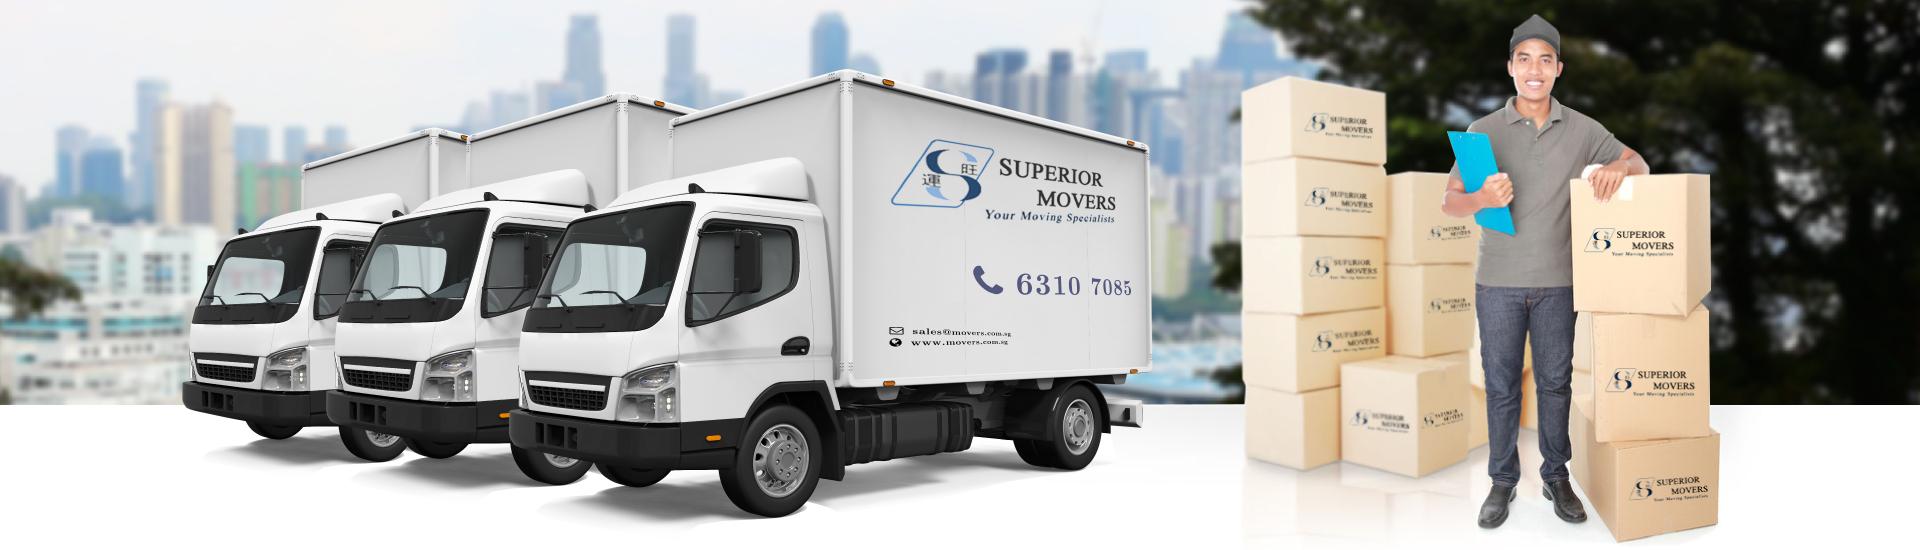 Superior Moving Service